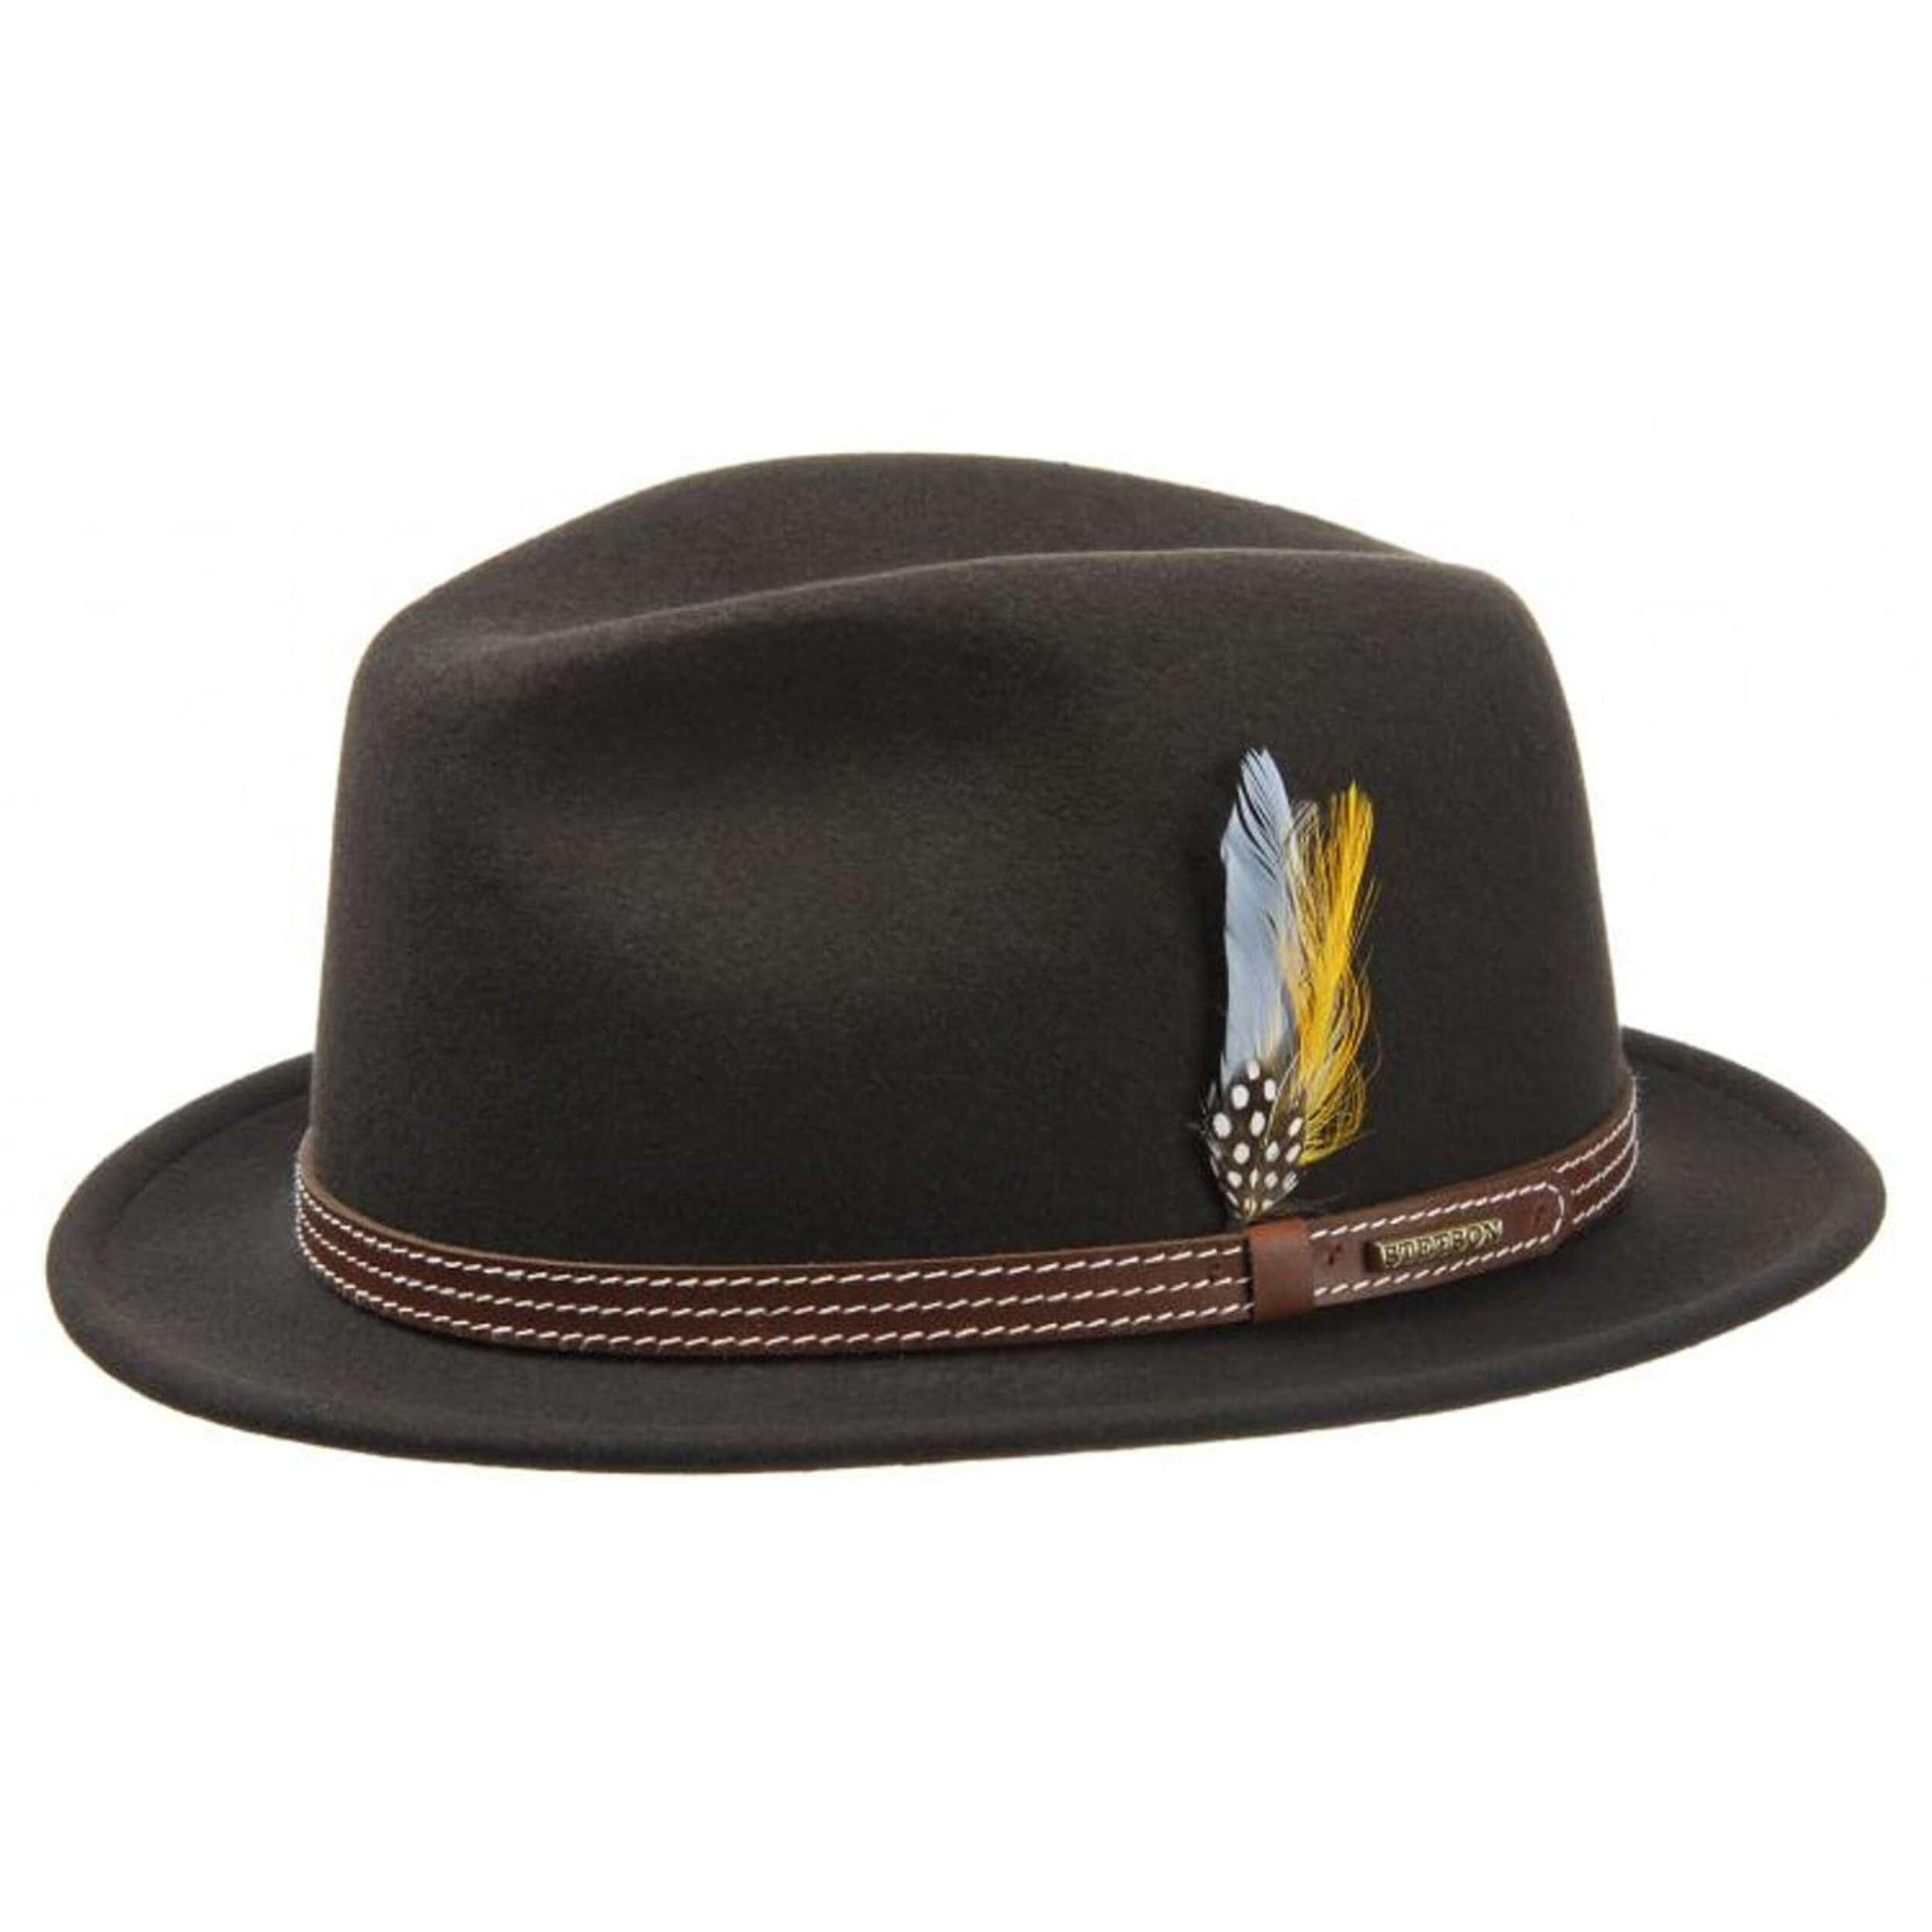 how to fix a felt hat